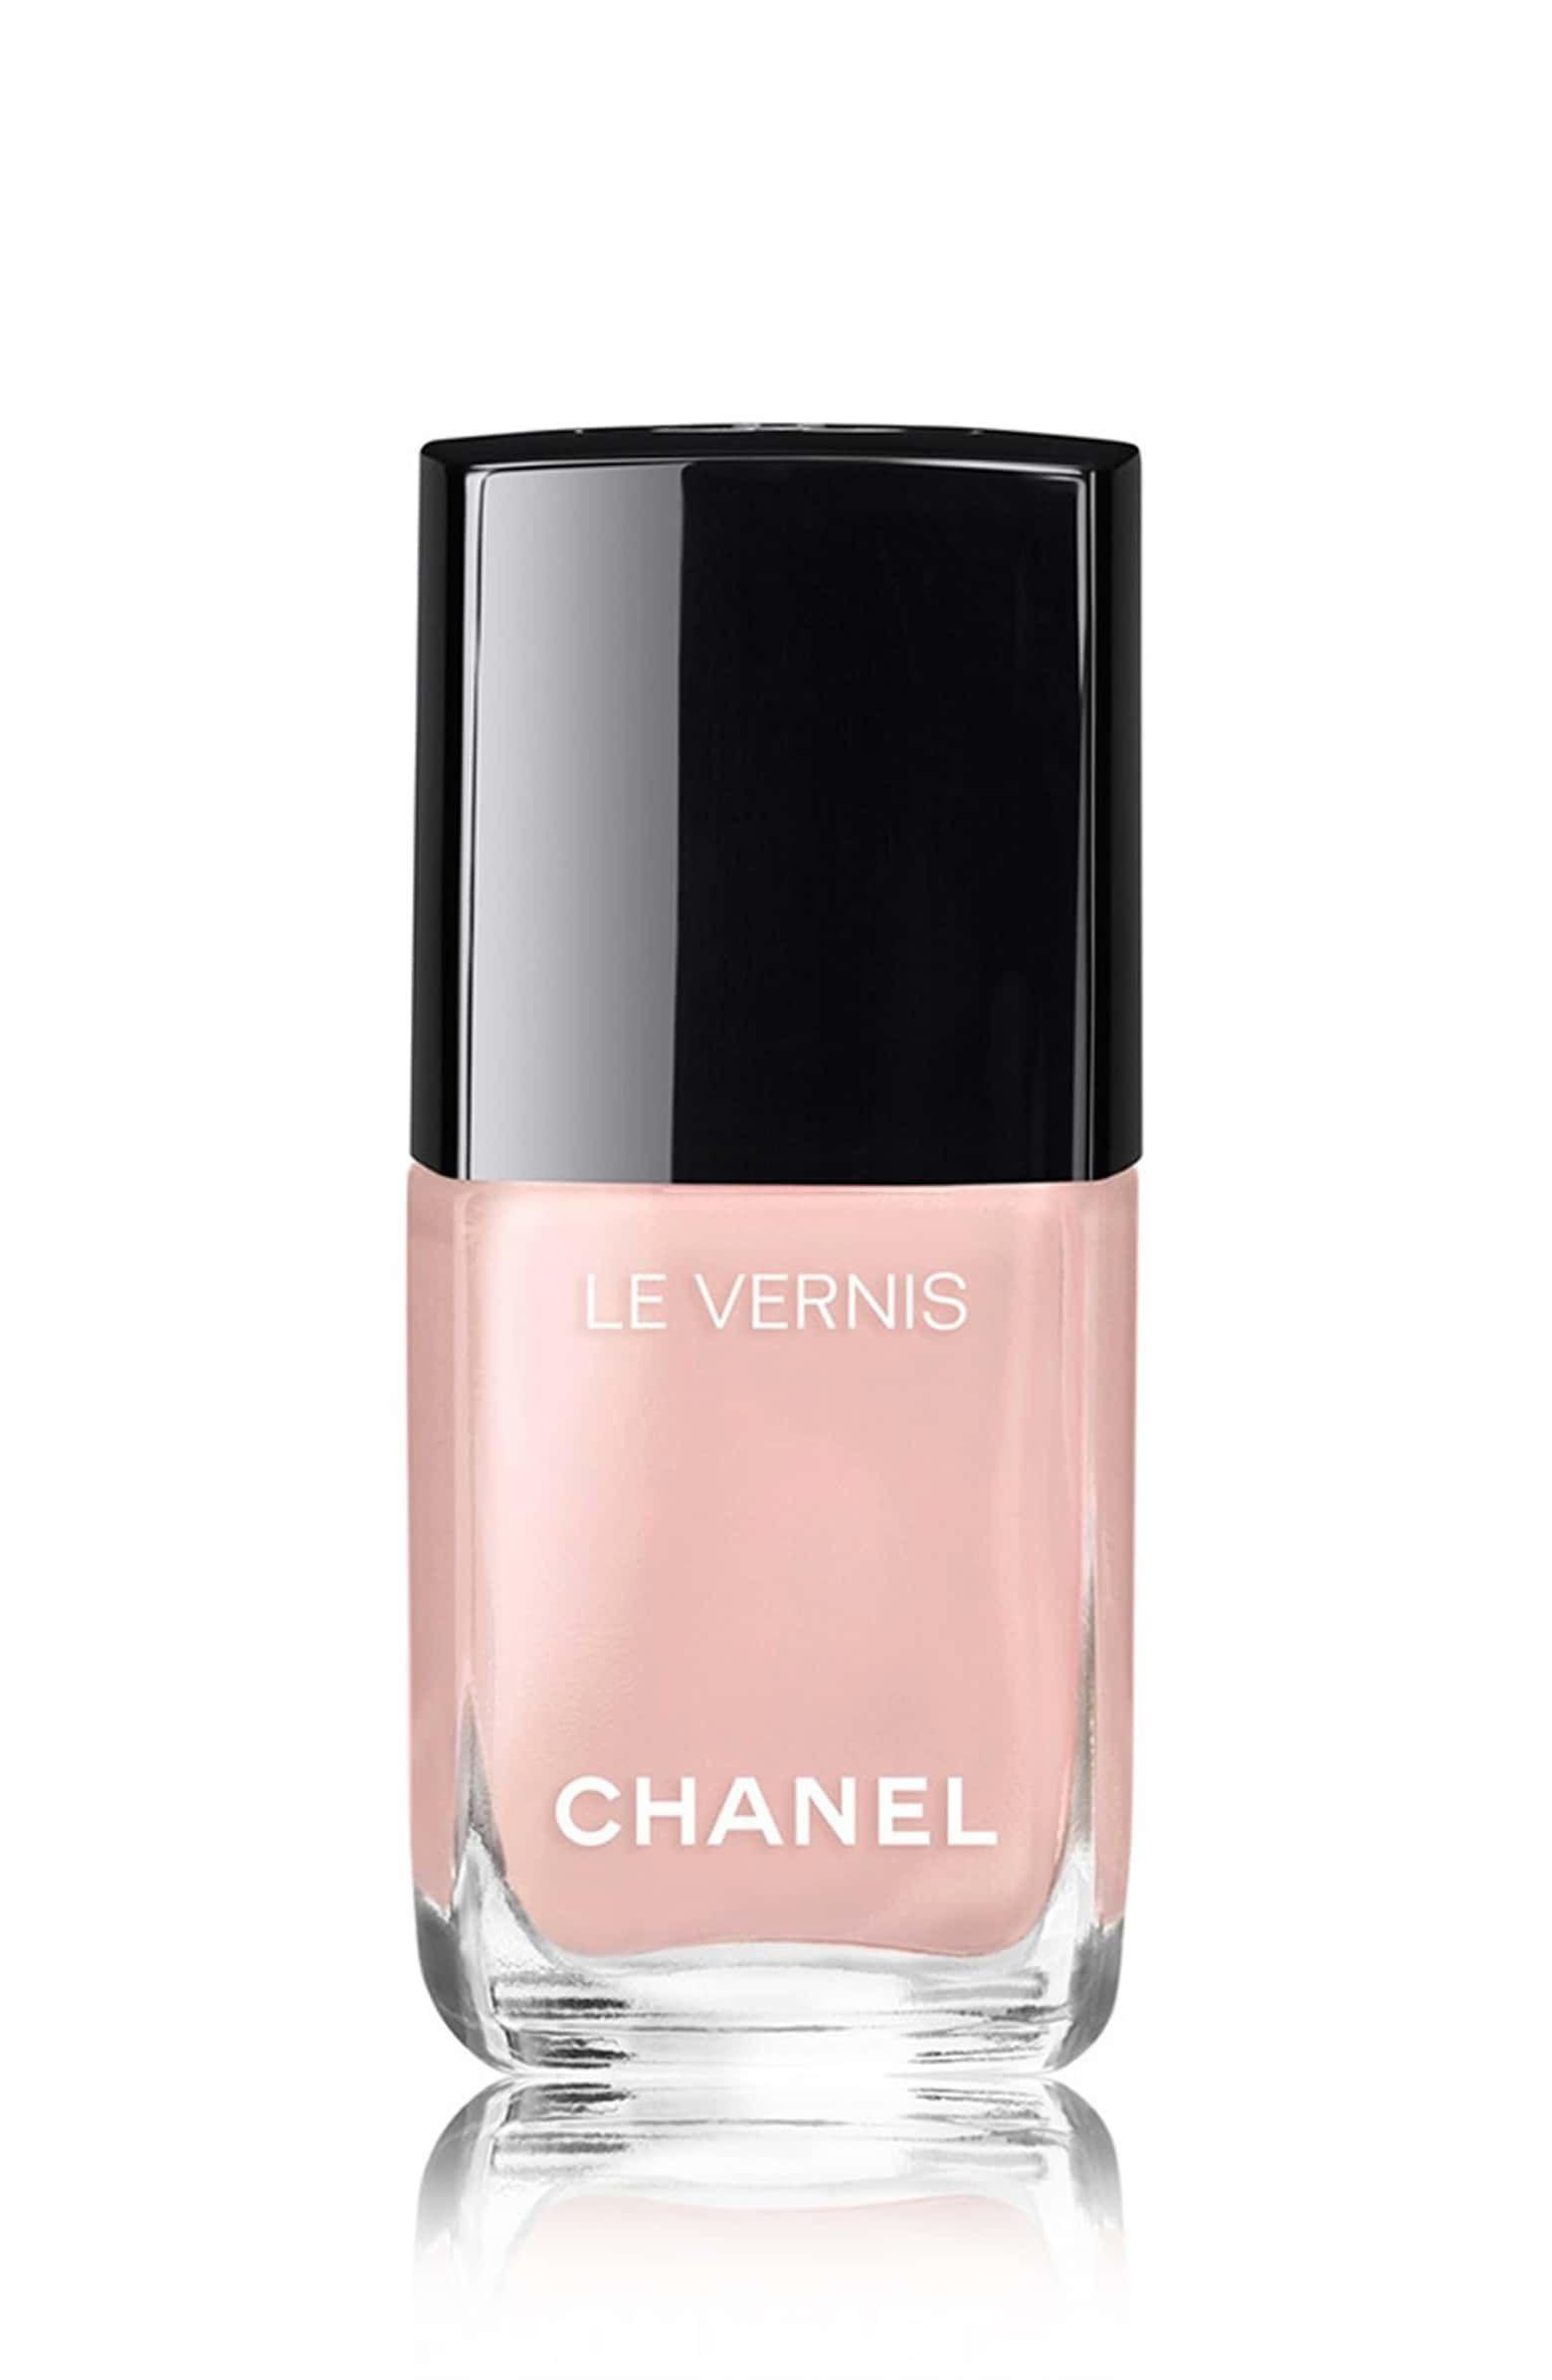 Le Vernis Longwear Nail Colour in Ballerina